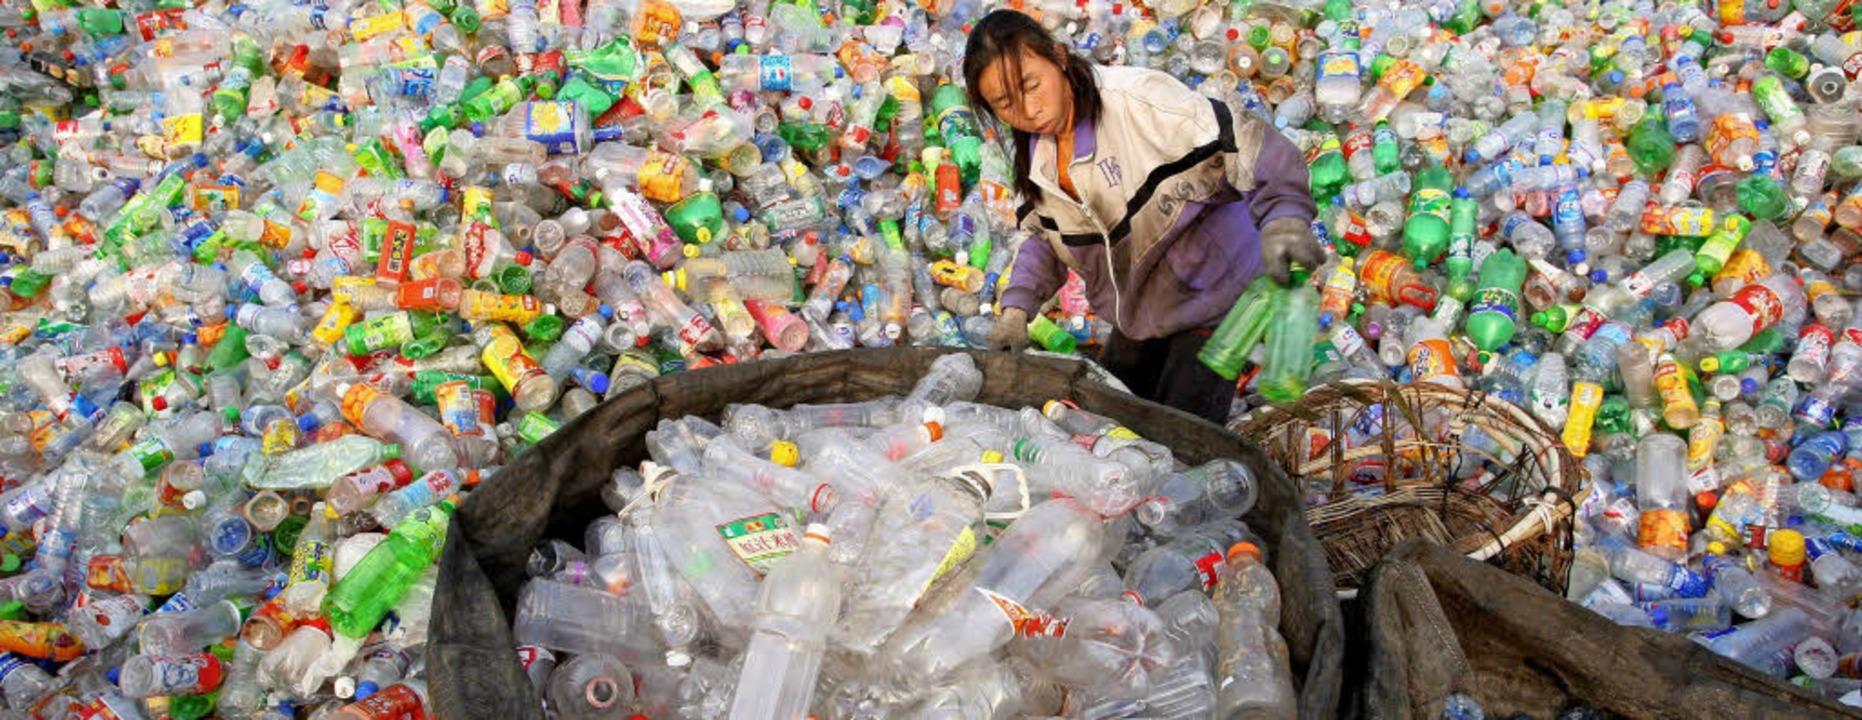 <ppp></ppp> oder Recycling in Asien &#...ing können  Anleger das unterstützen.   | Foto: dpa